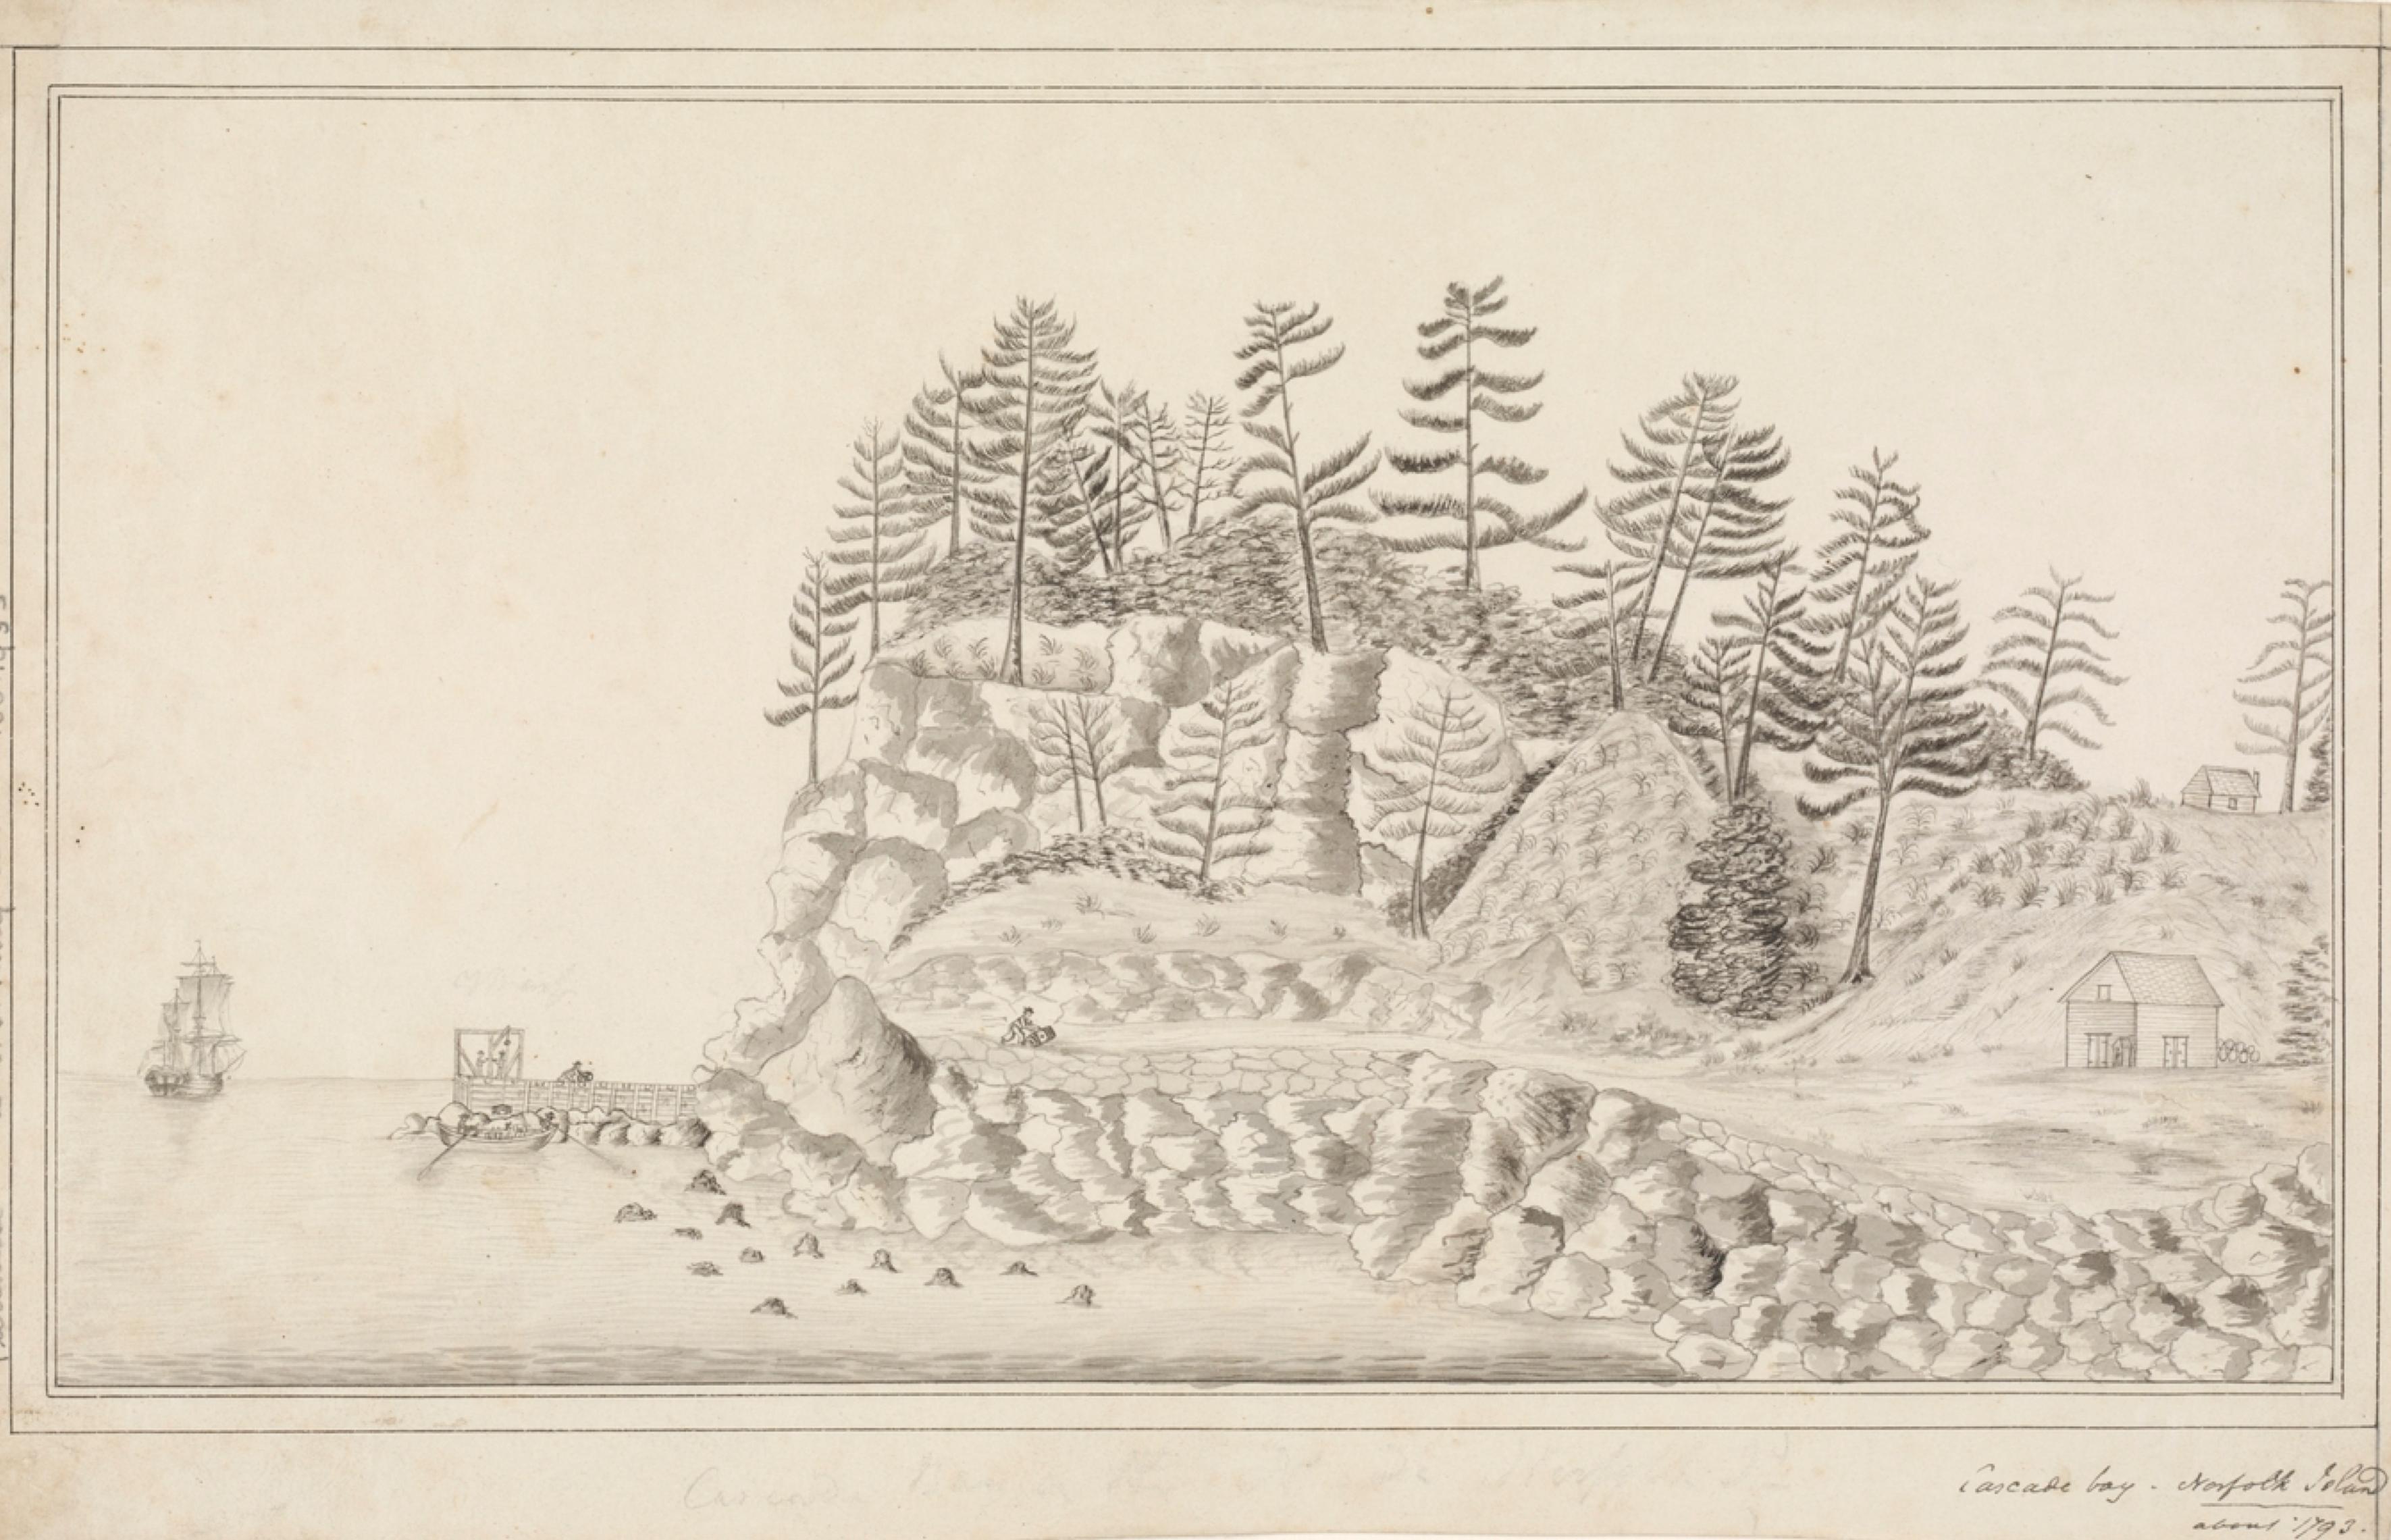 Cascade Bay - Norfolk Island, about 1793